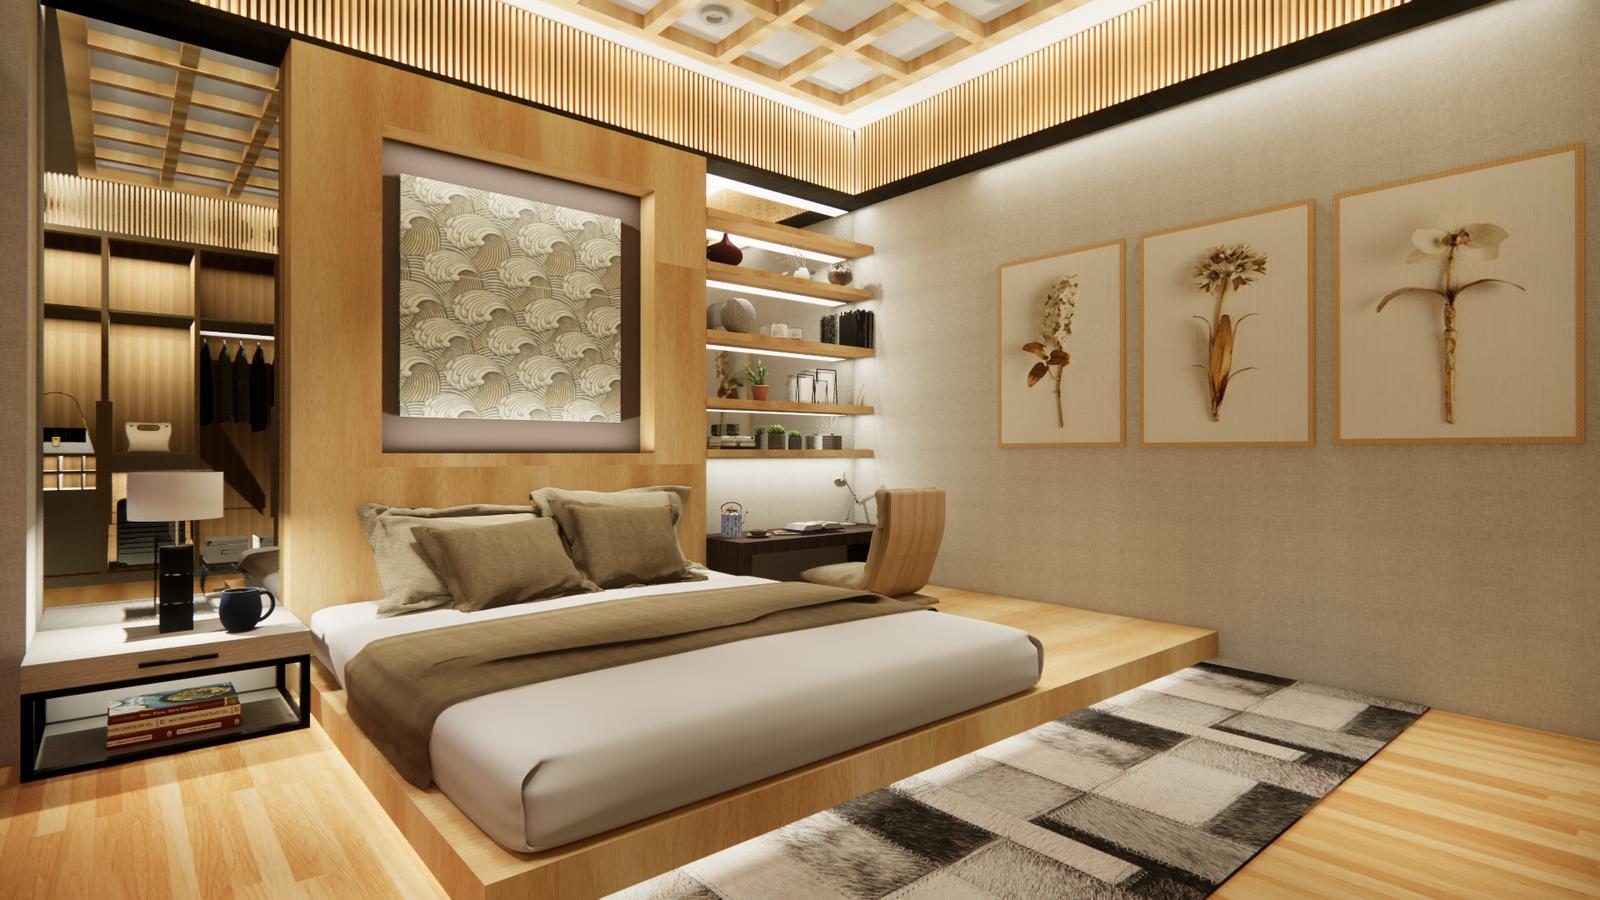 Naniwa Senior Living Center - Apartment Unit's Bedroom 2